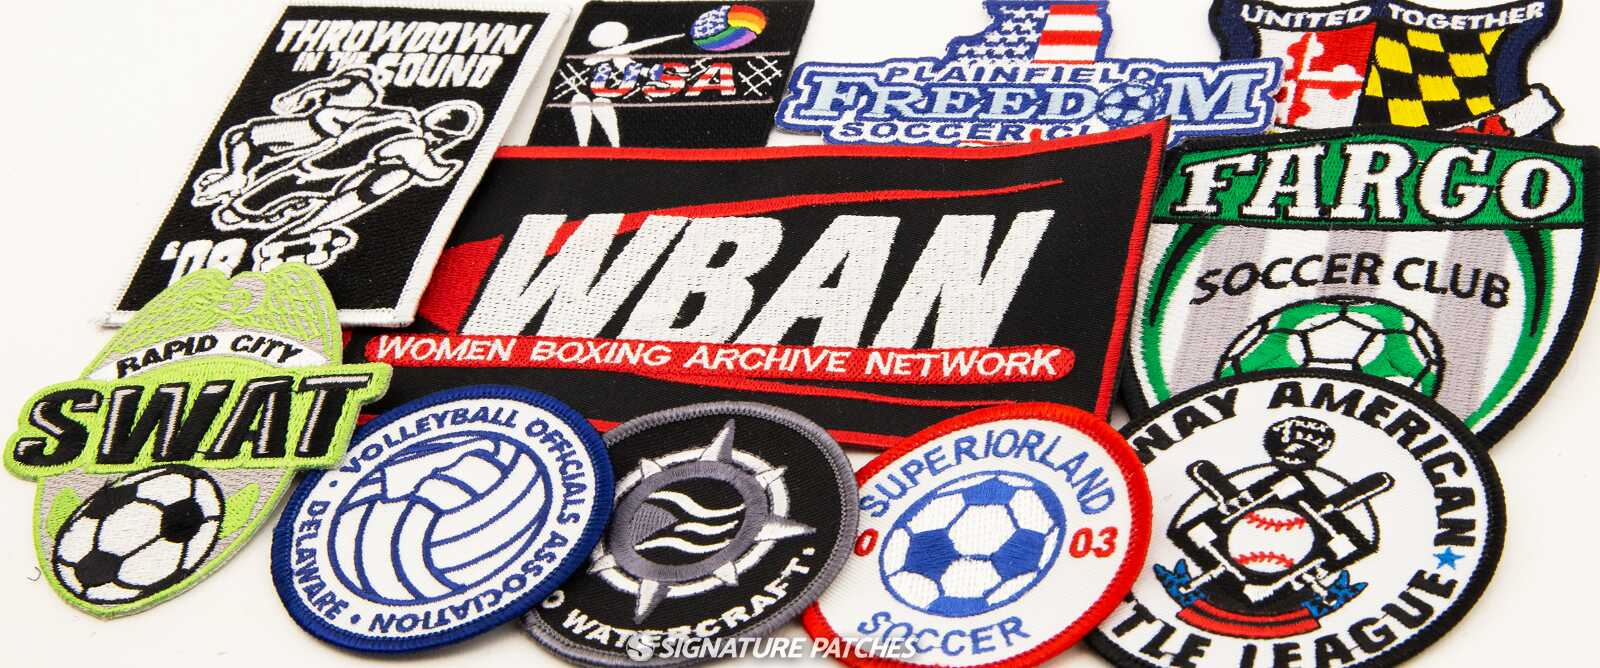 signaturepatches-Sports-patches